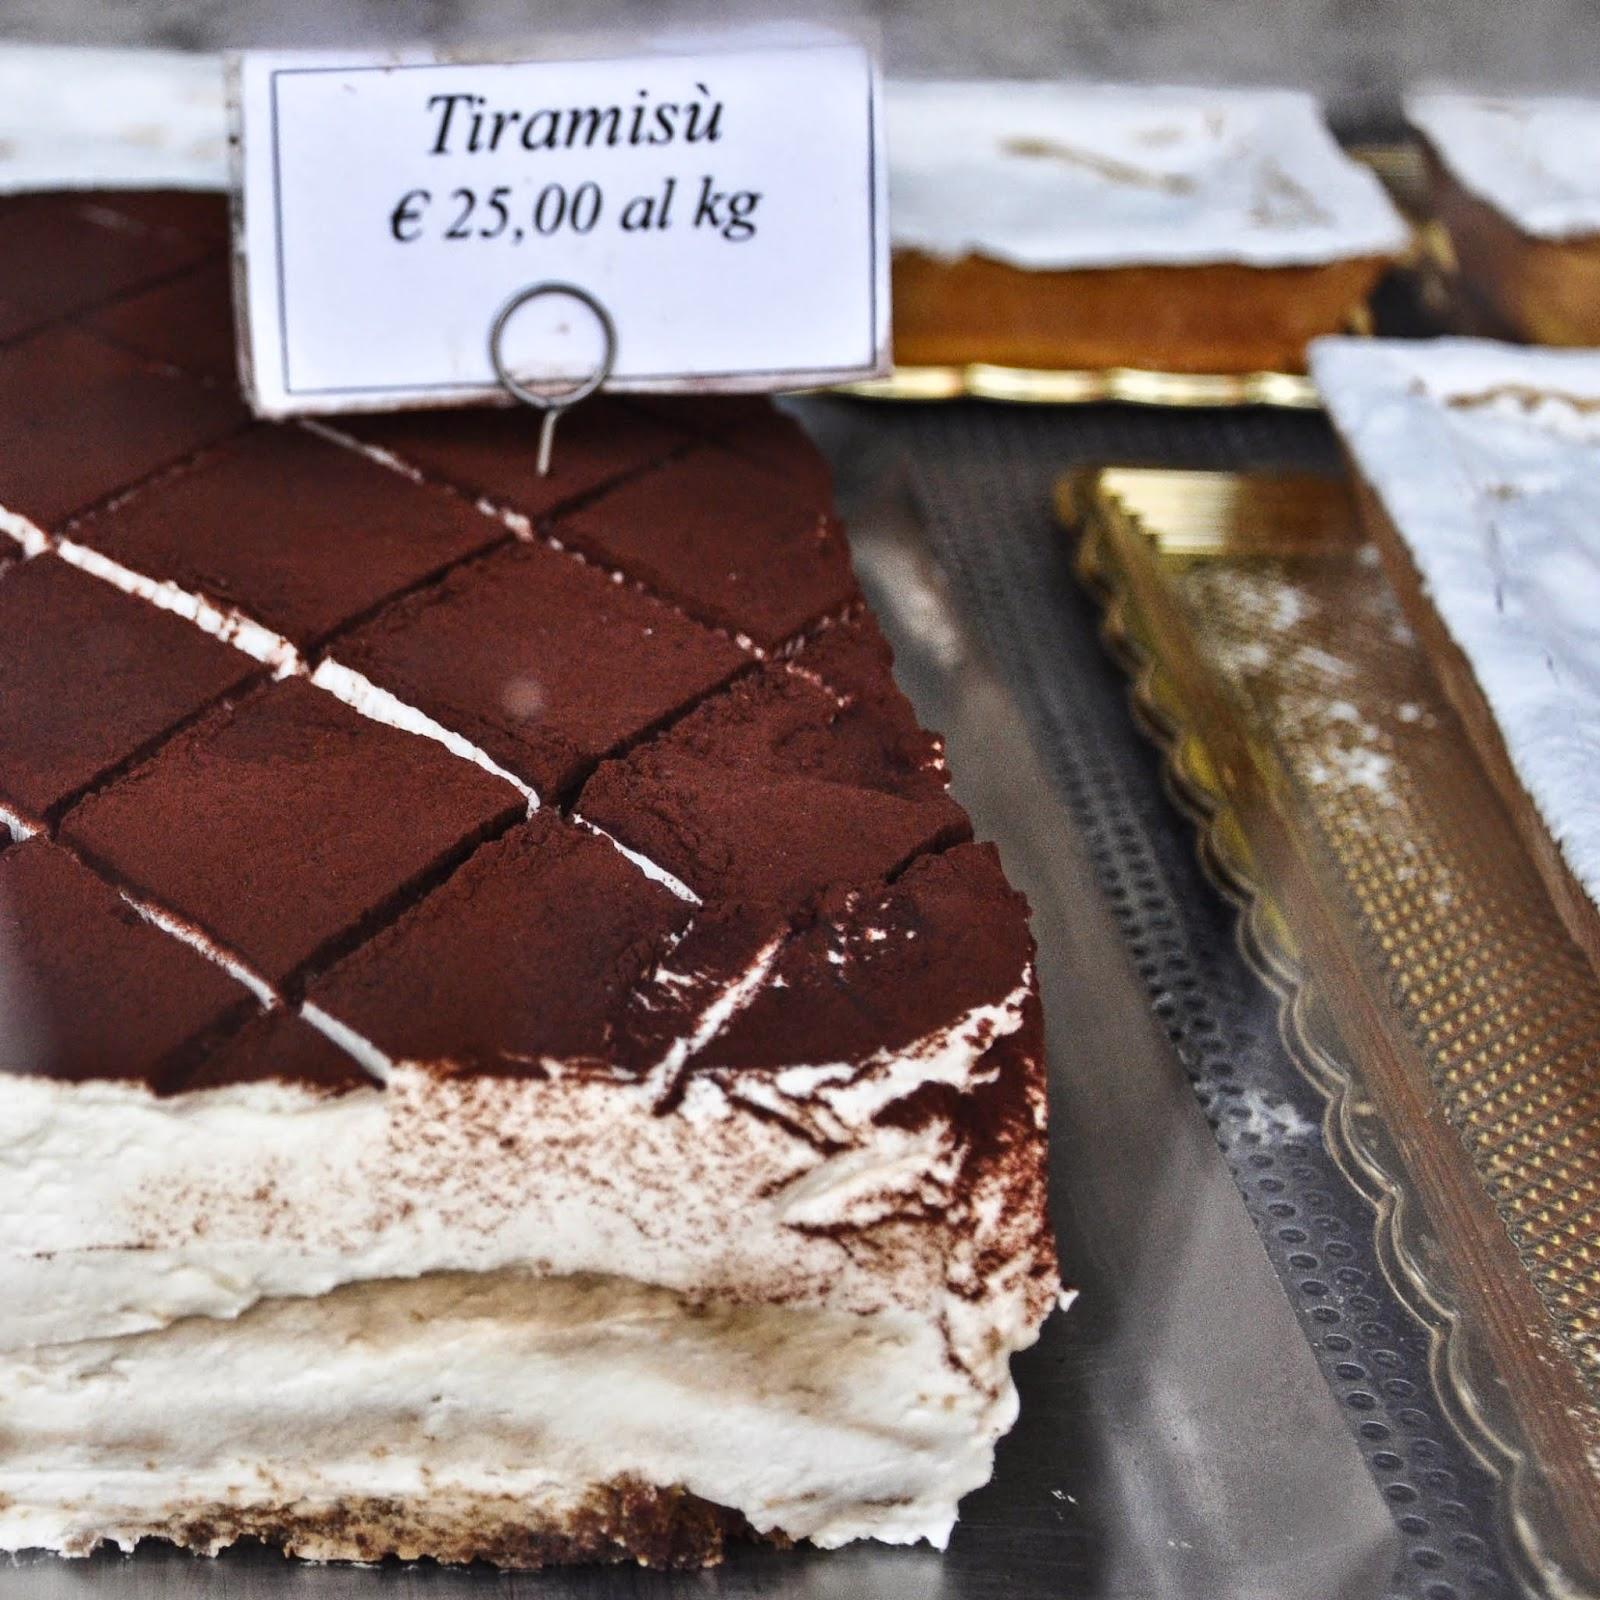 A slab of tiramisu, Venice